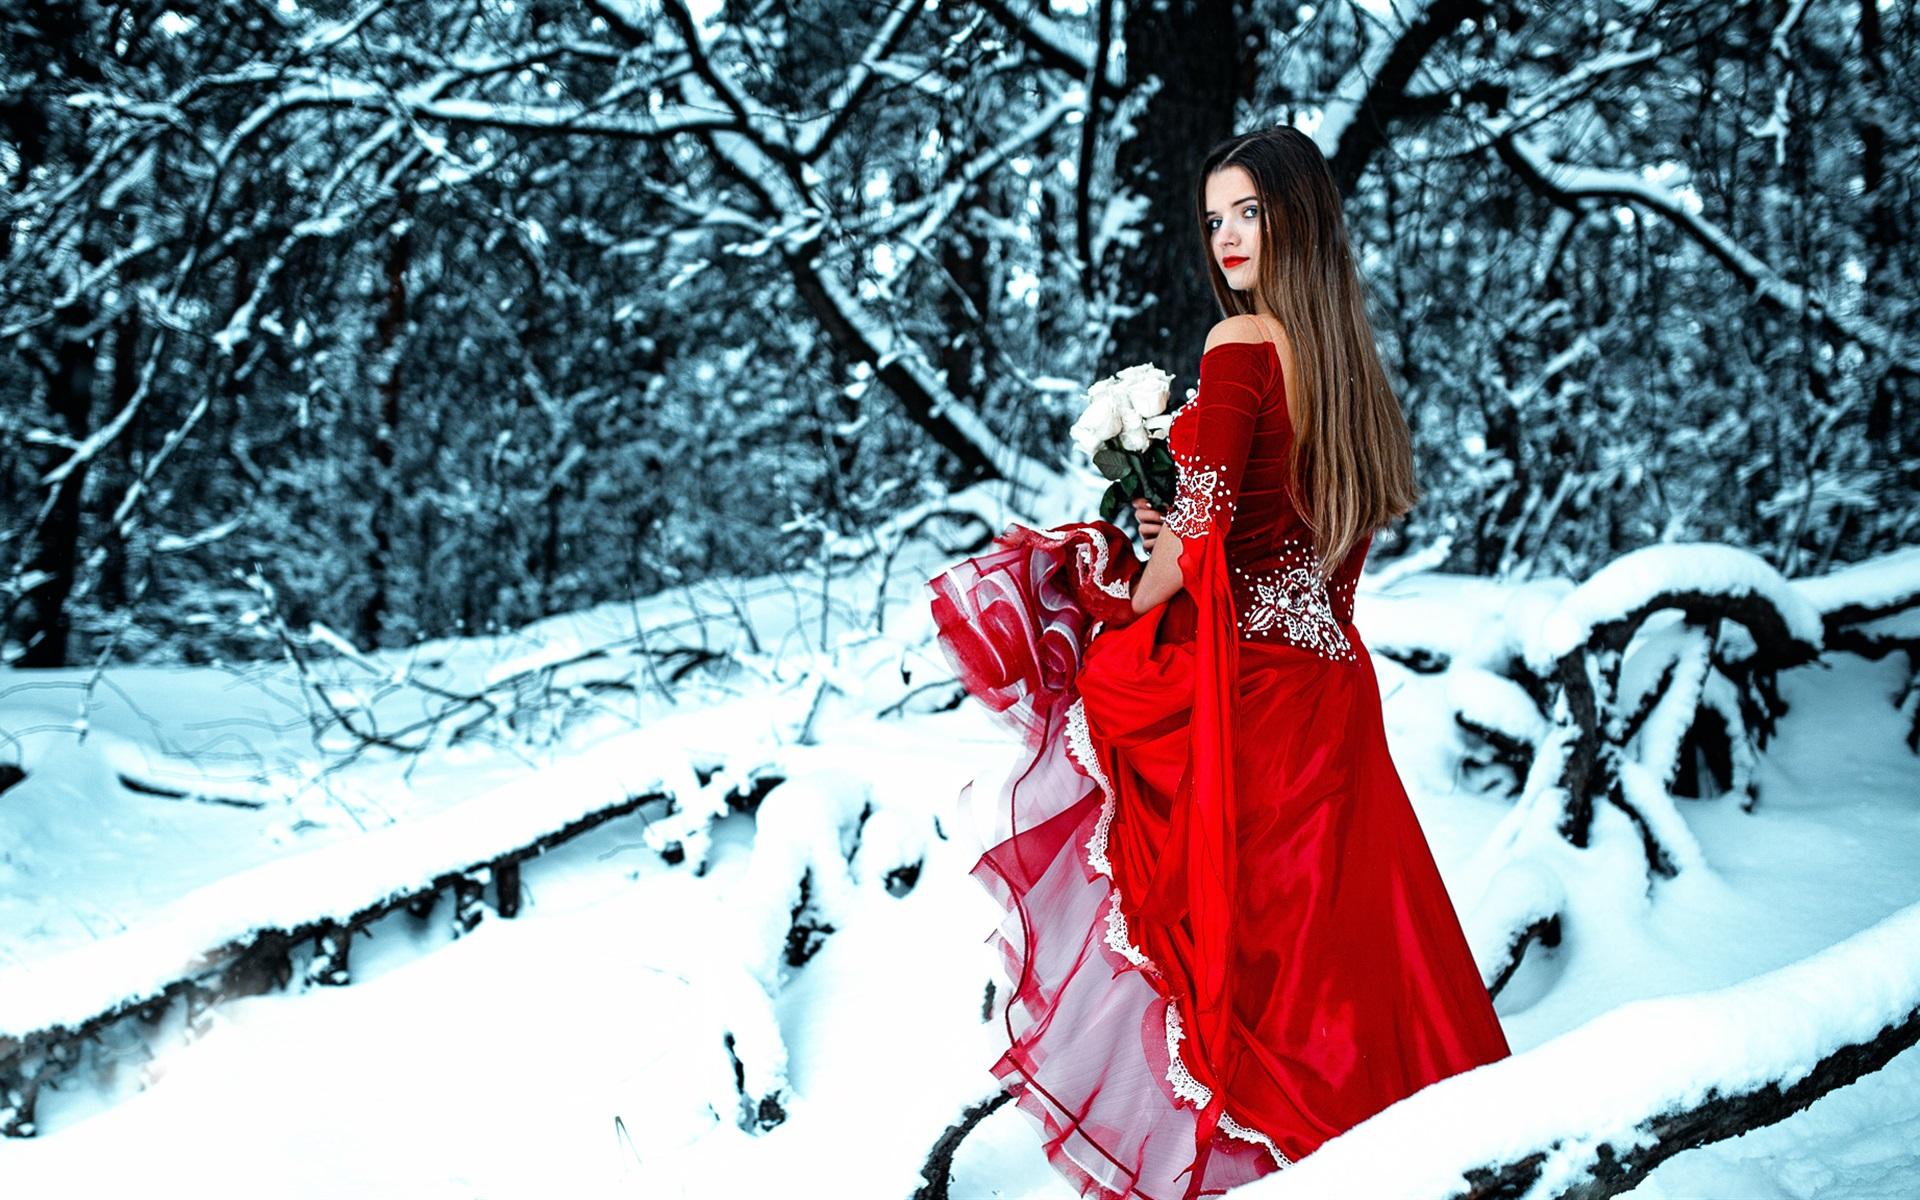 Wallpaper red dress girl in winter look back rose snow - Rose in snow wallpaper ...